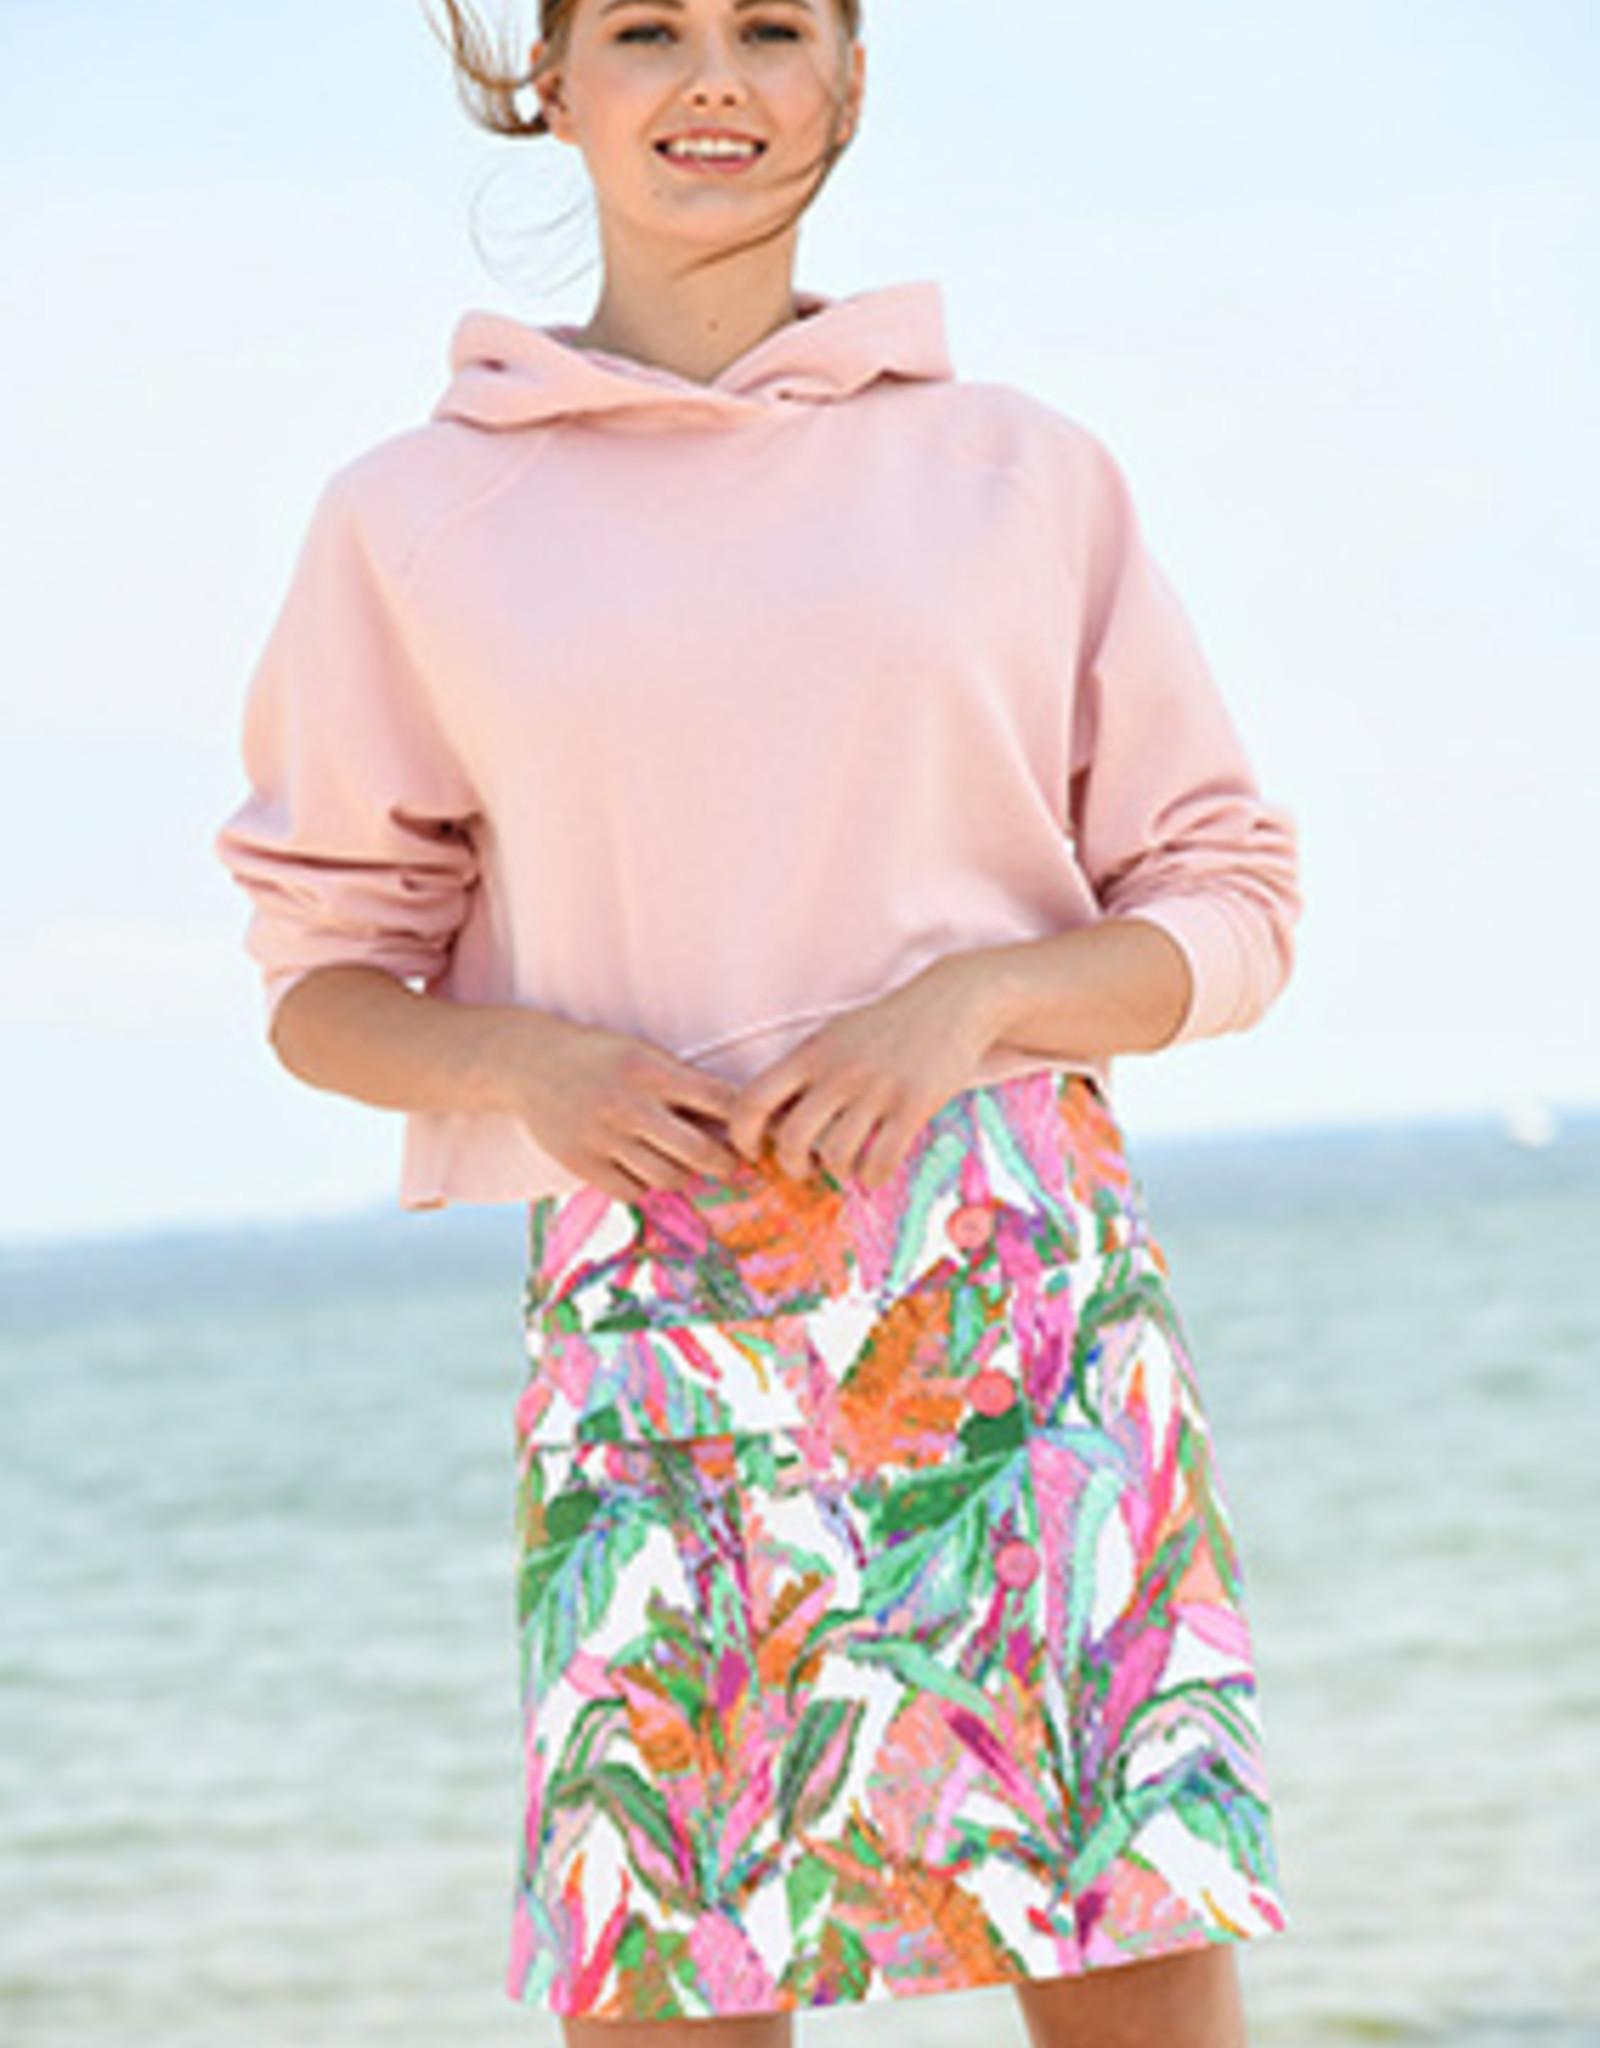 Hilco Fashion Trends by Hilco nr 38 lente/zomer 2021 - naaimagazine